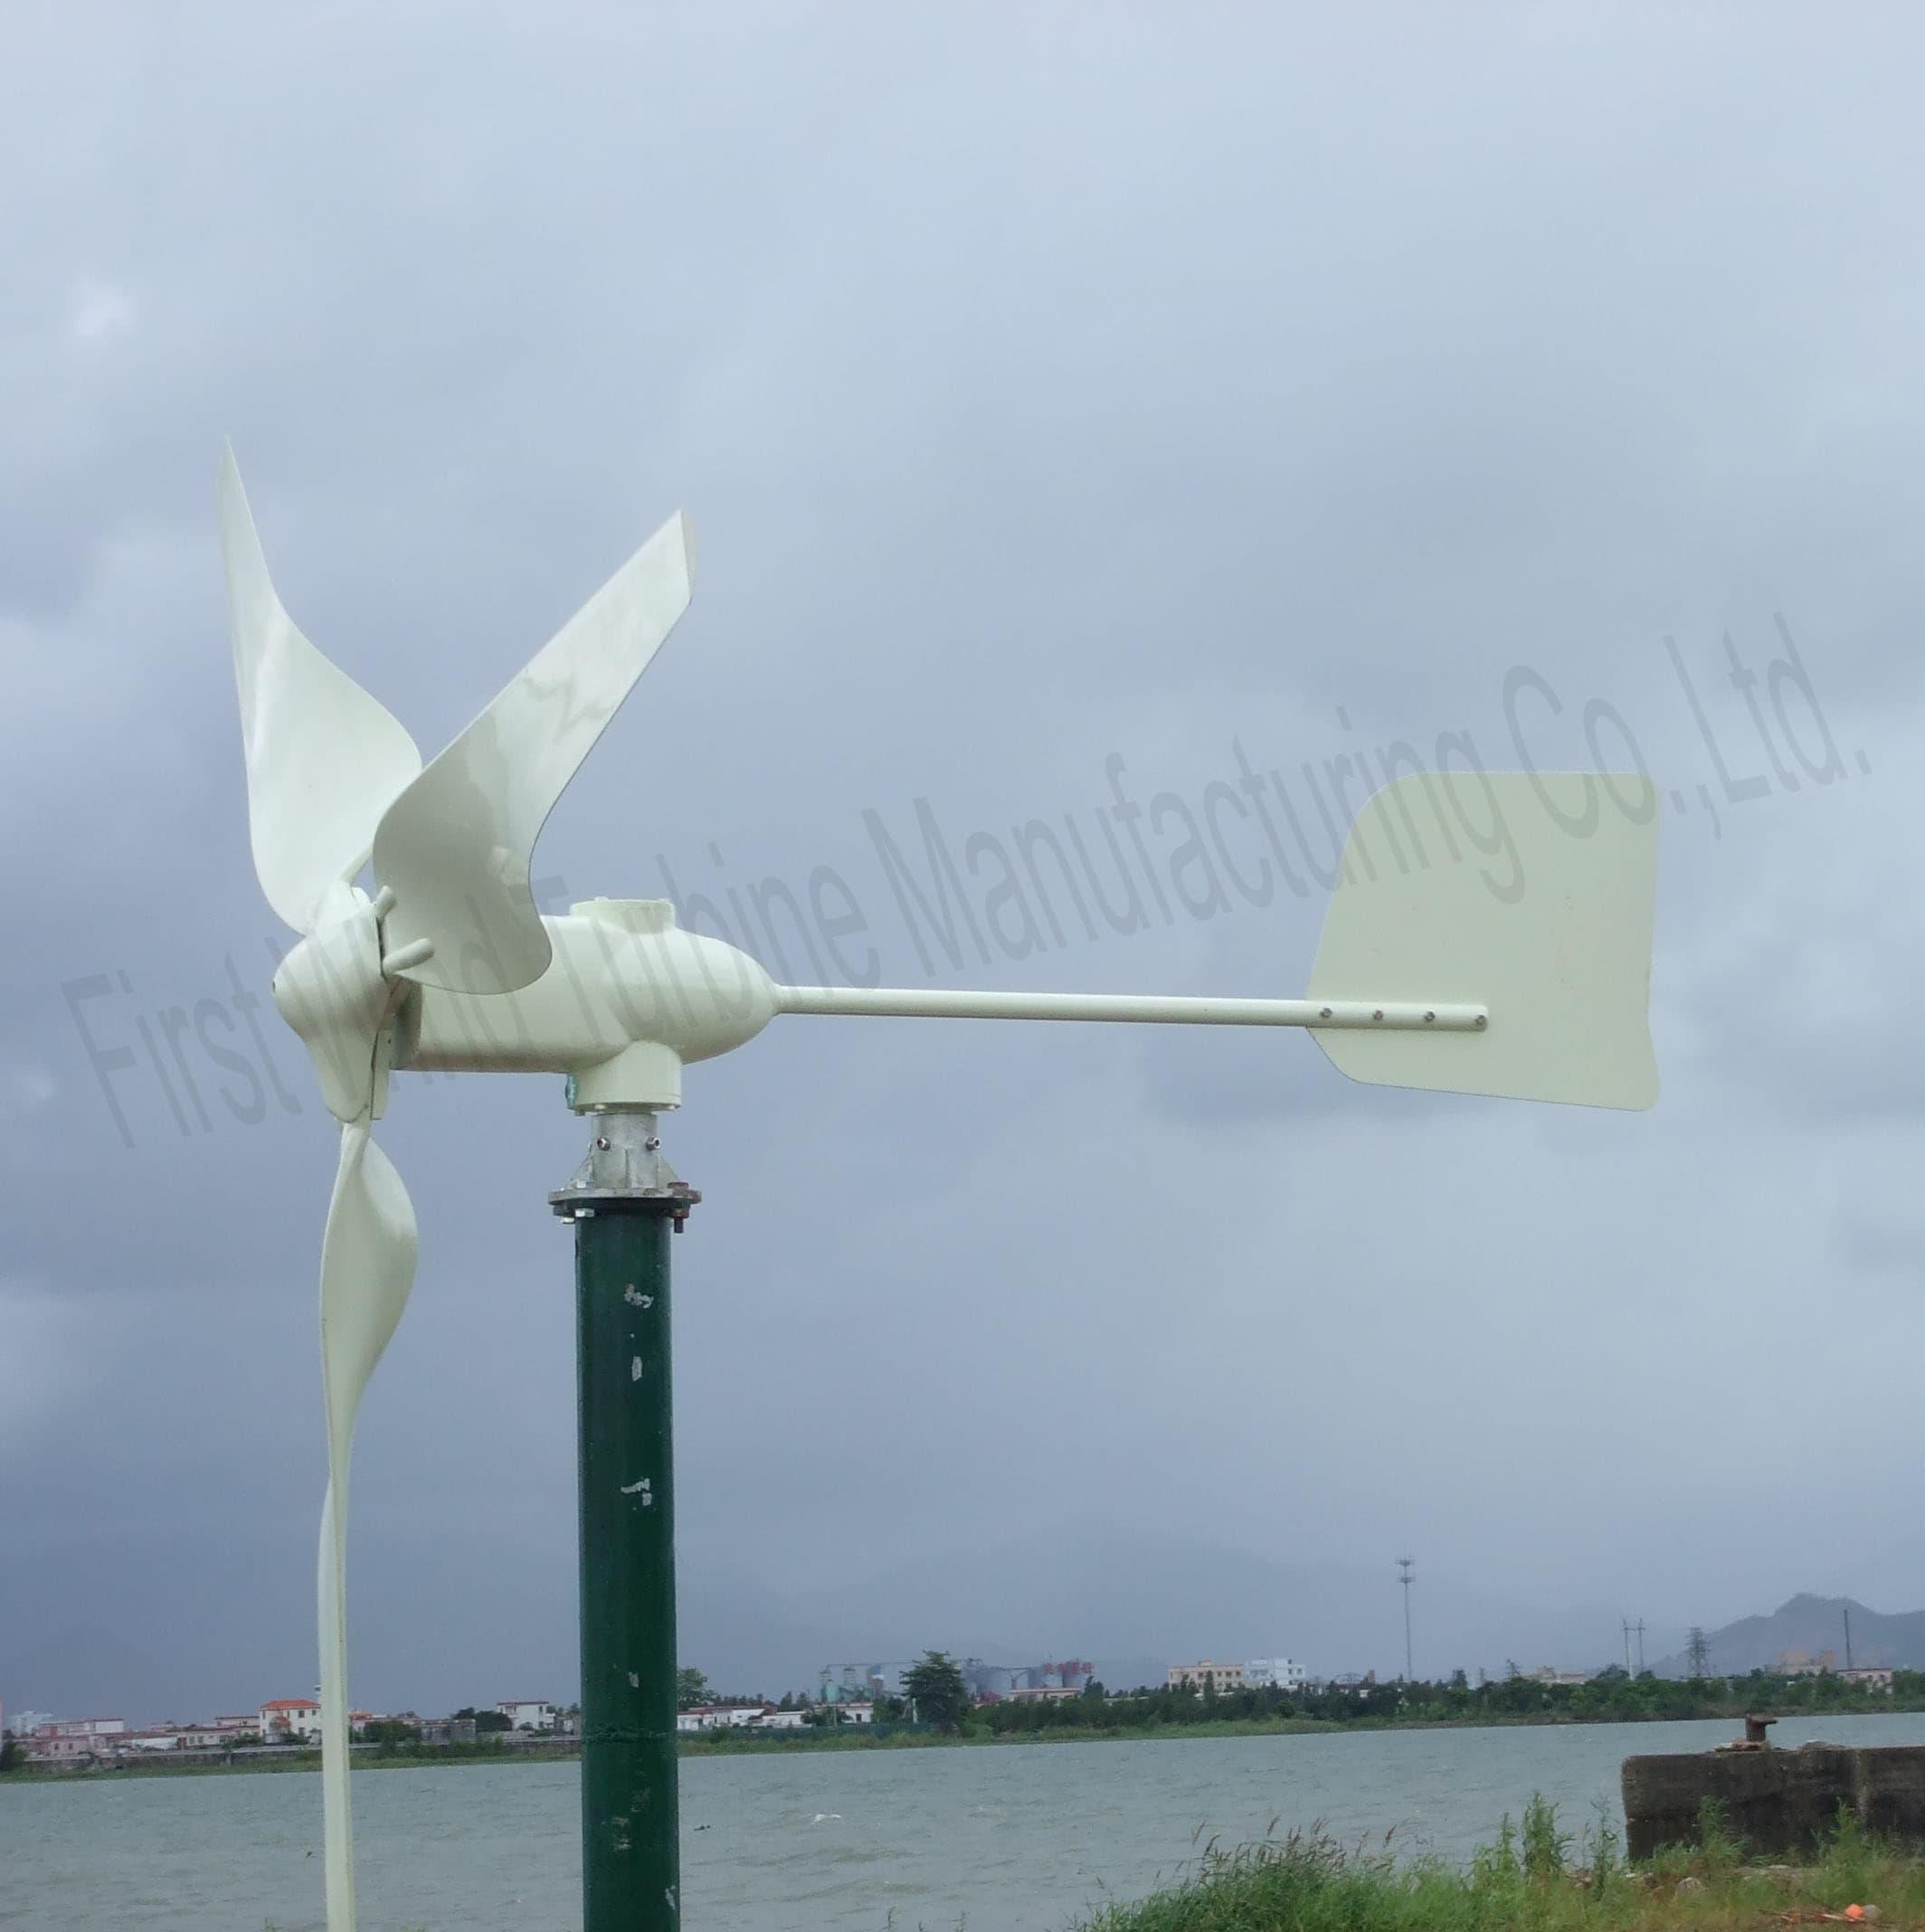 Mini Wind Turbine WK 750 from First Wind Turbine Manufacturing